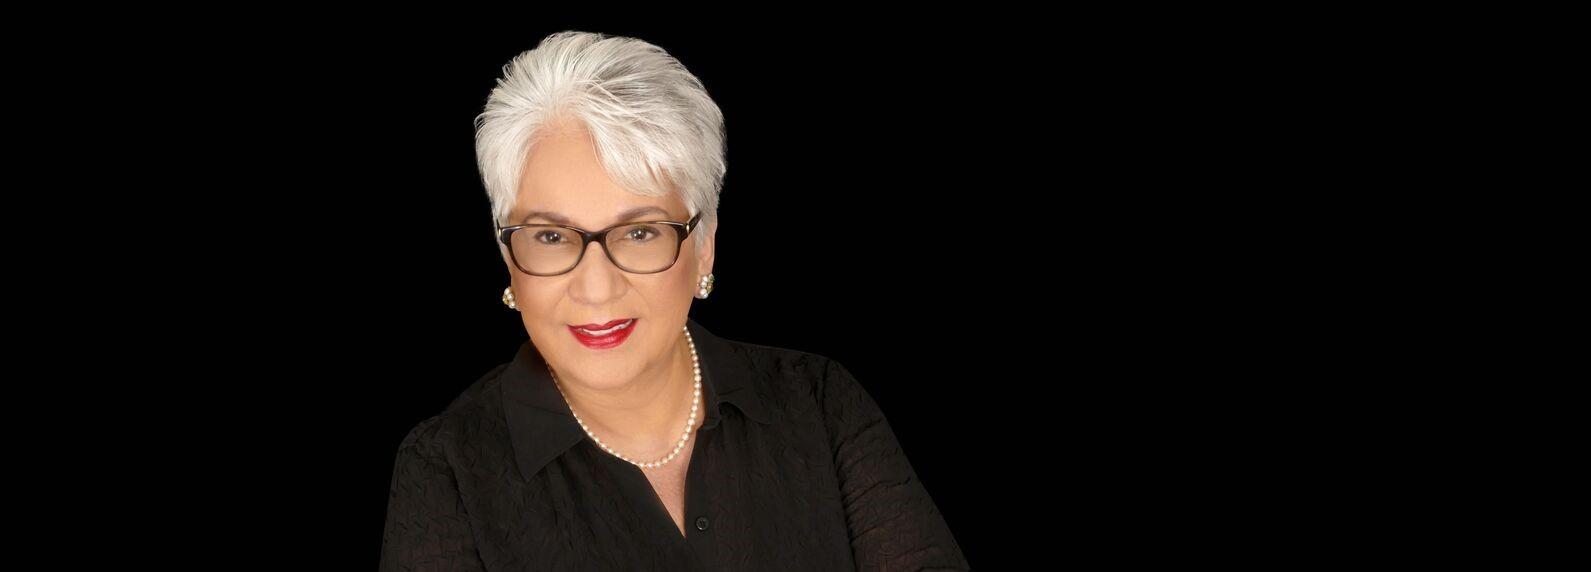 Suzanne Frias